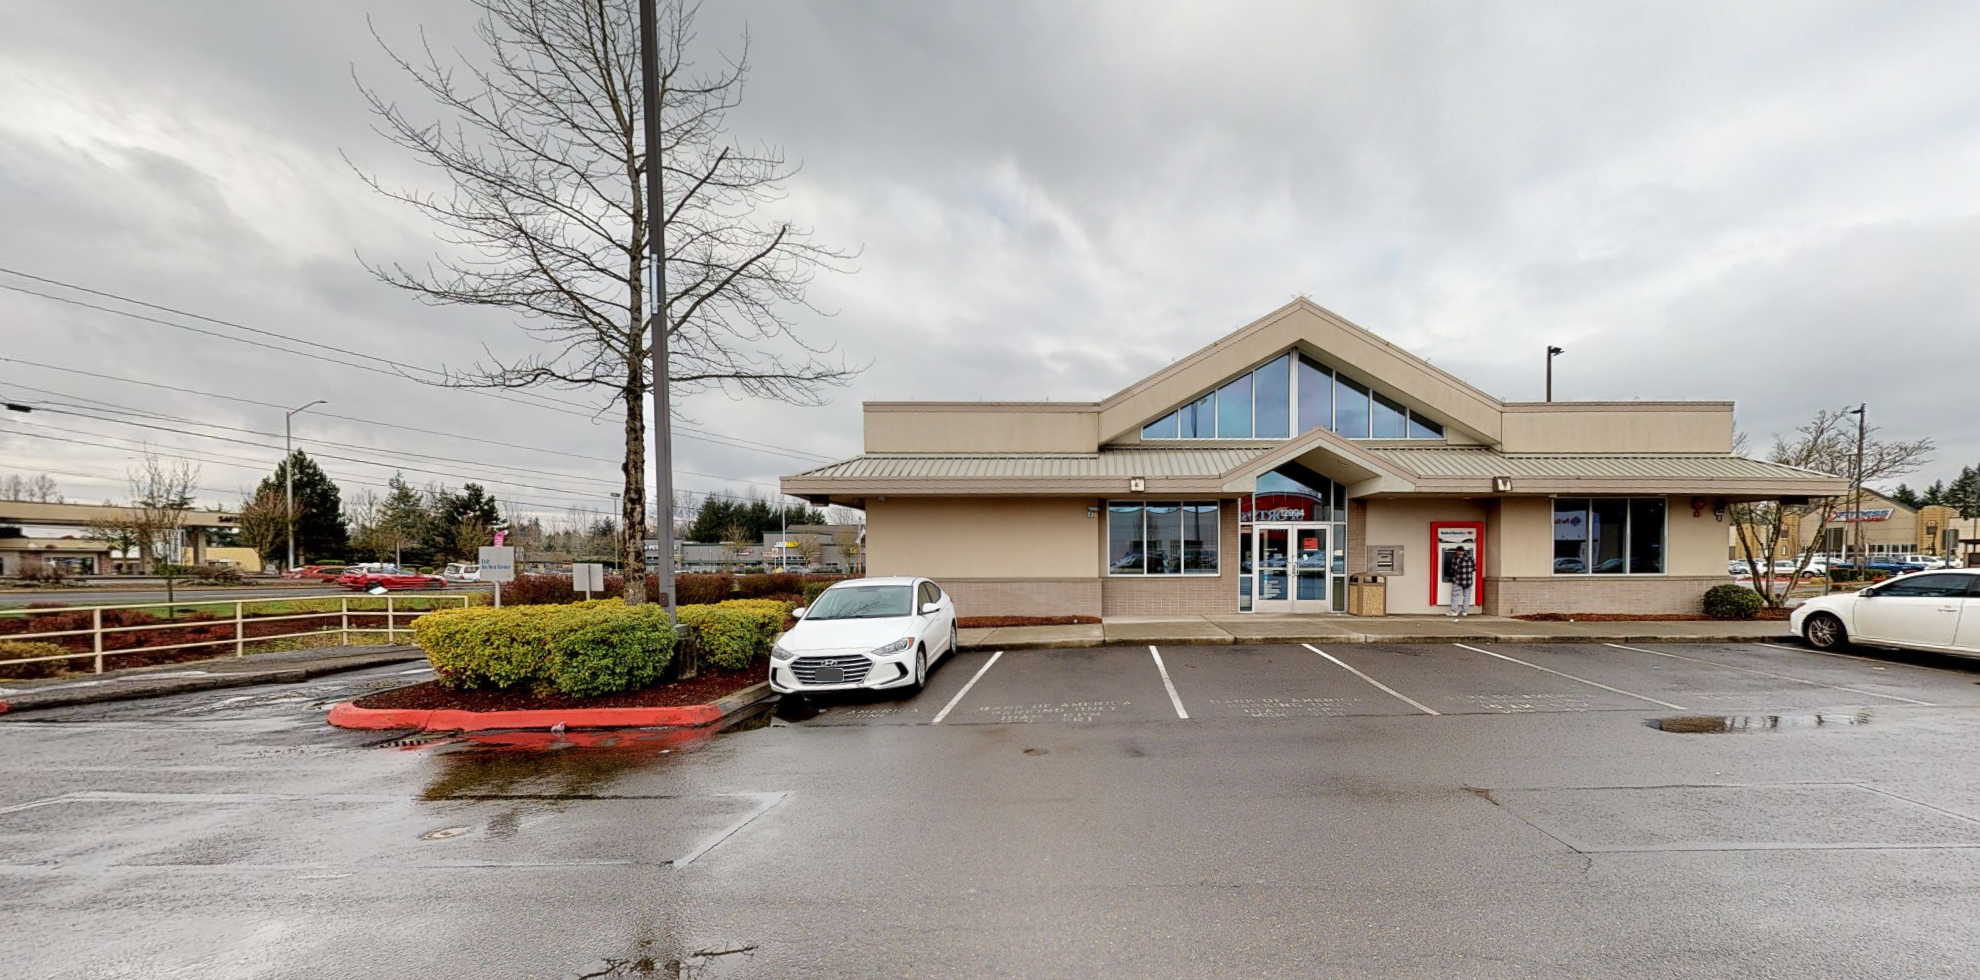 Bank of America financial center with drive-thru ATM | 12994 SE Kent Kangley Rd, Kent, WA 98030